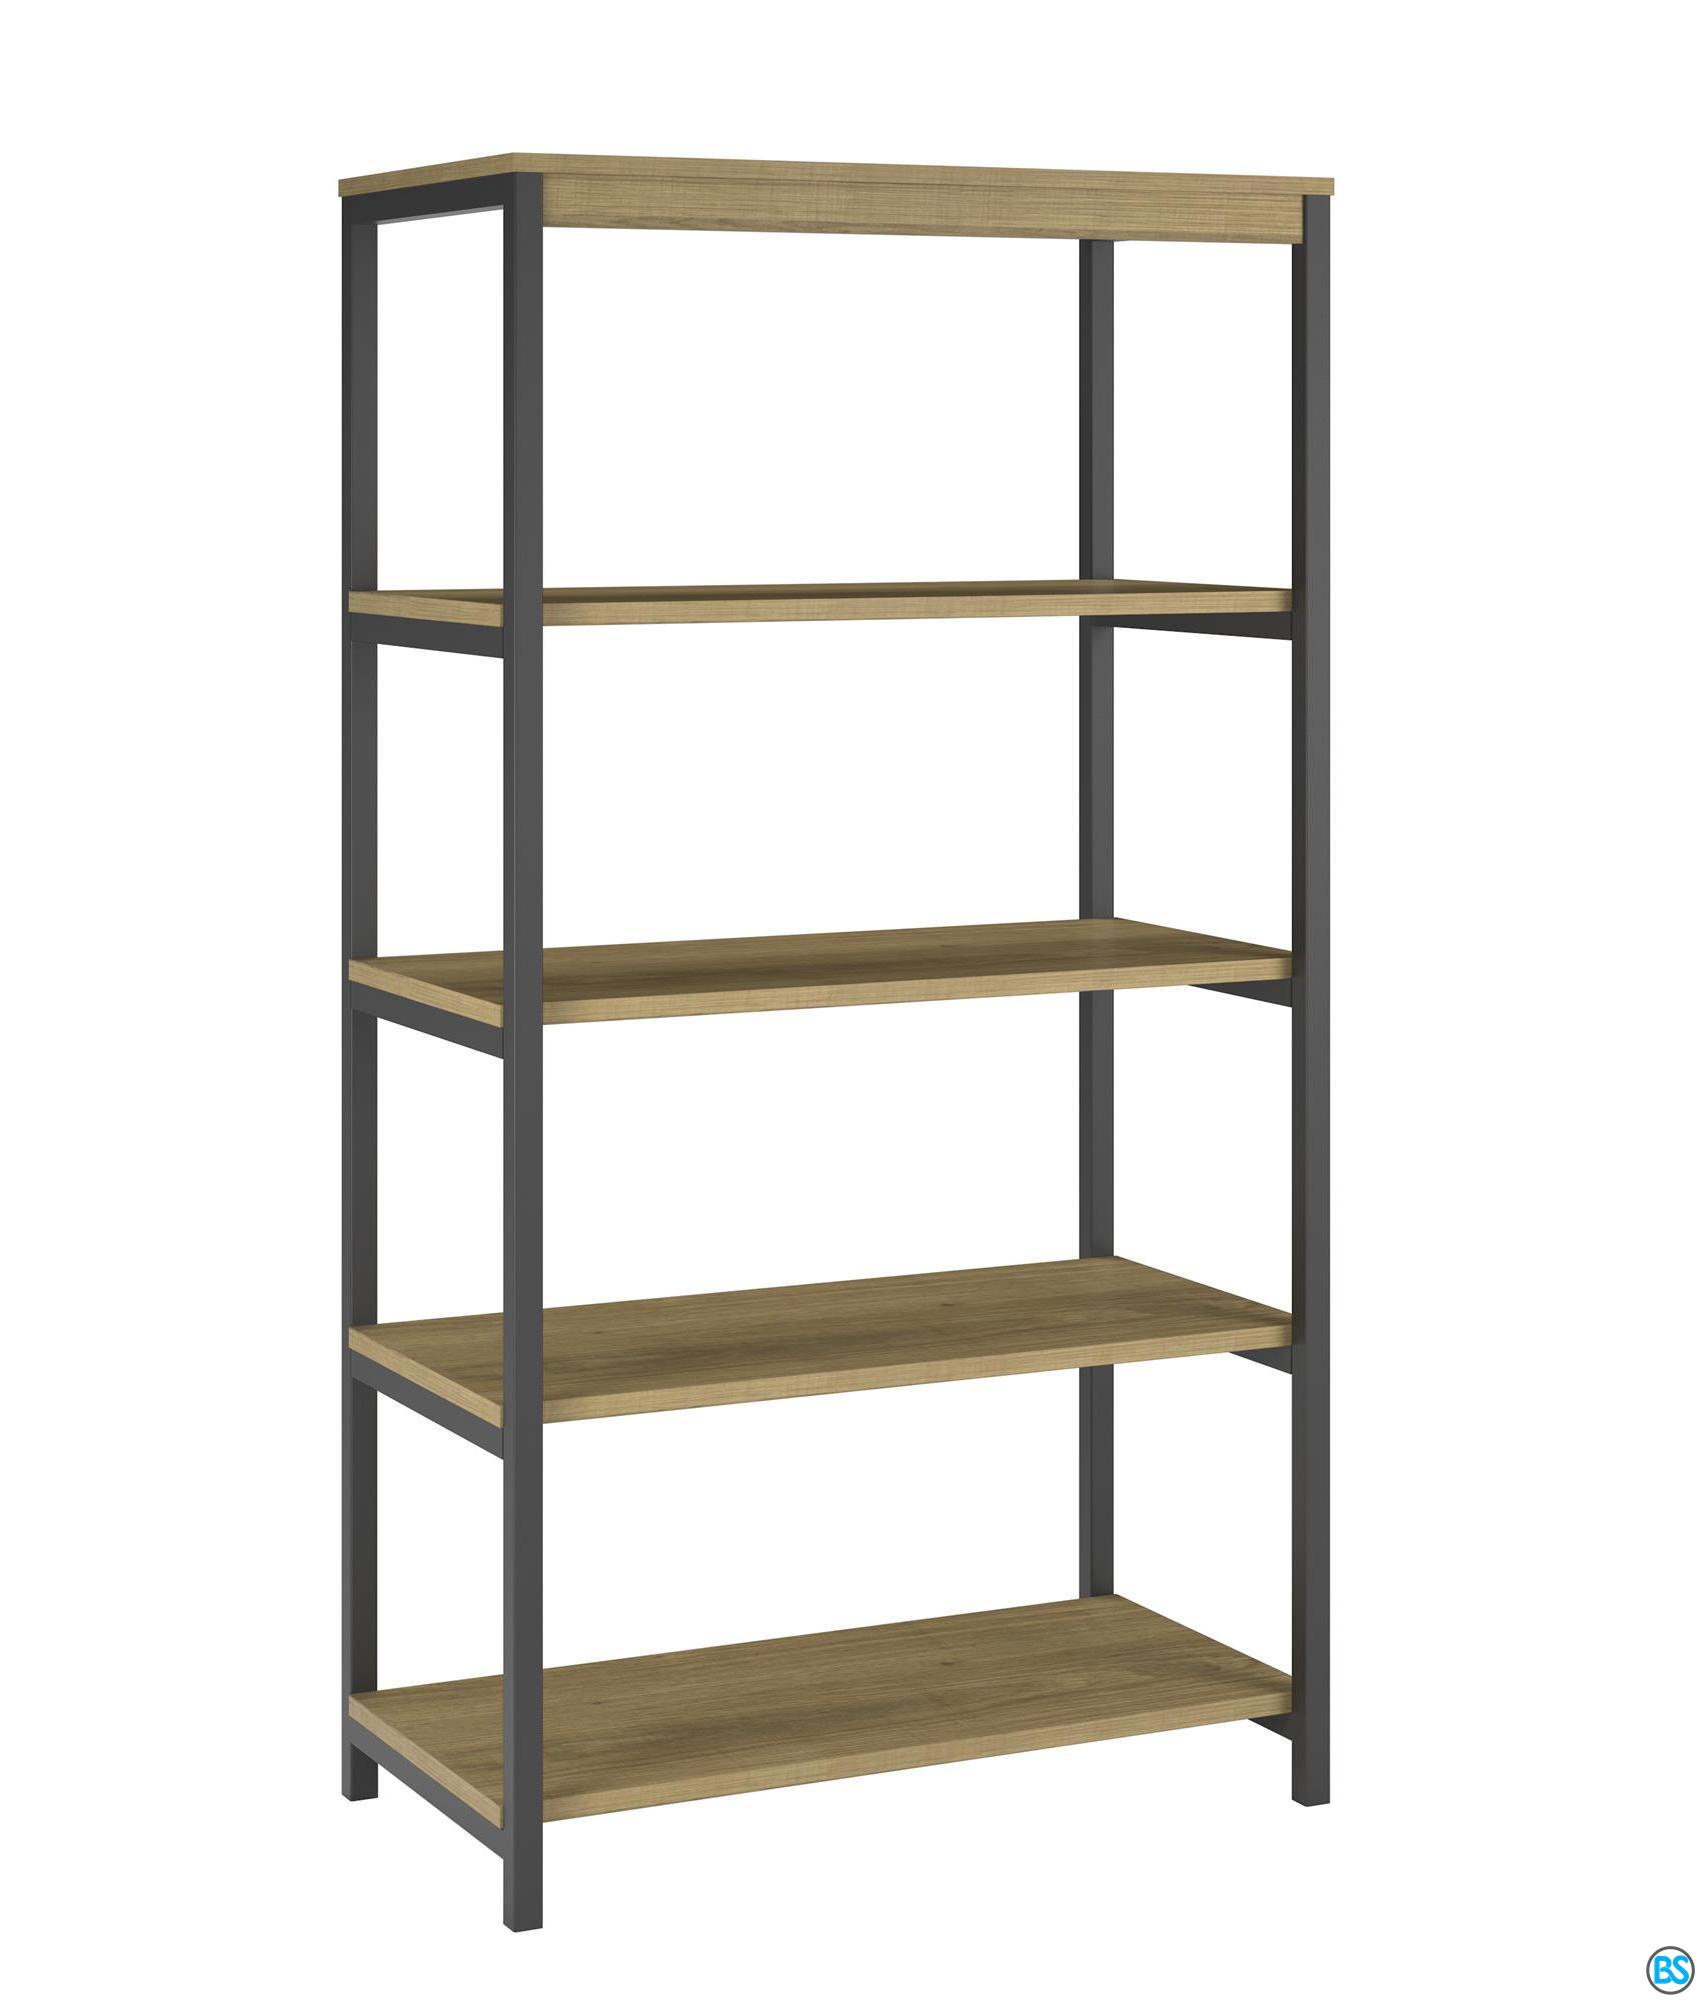 Ameriwood Home Nickle Creek 5 Shelf Bookcase, Golden Oak